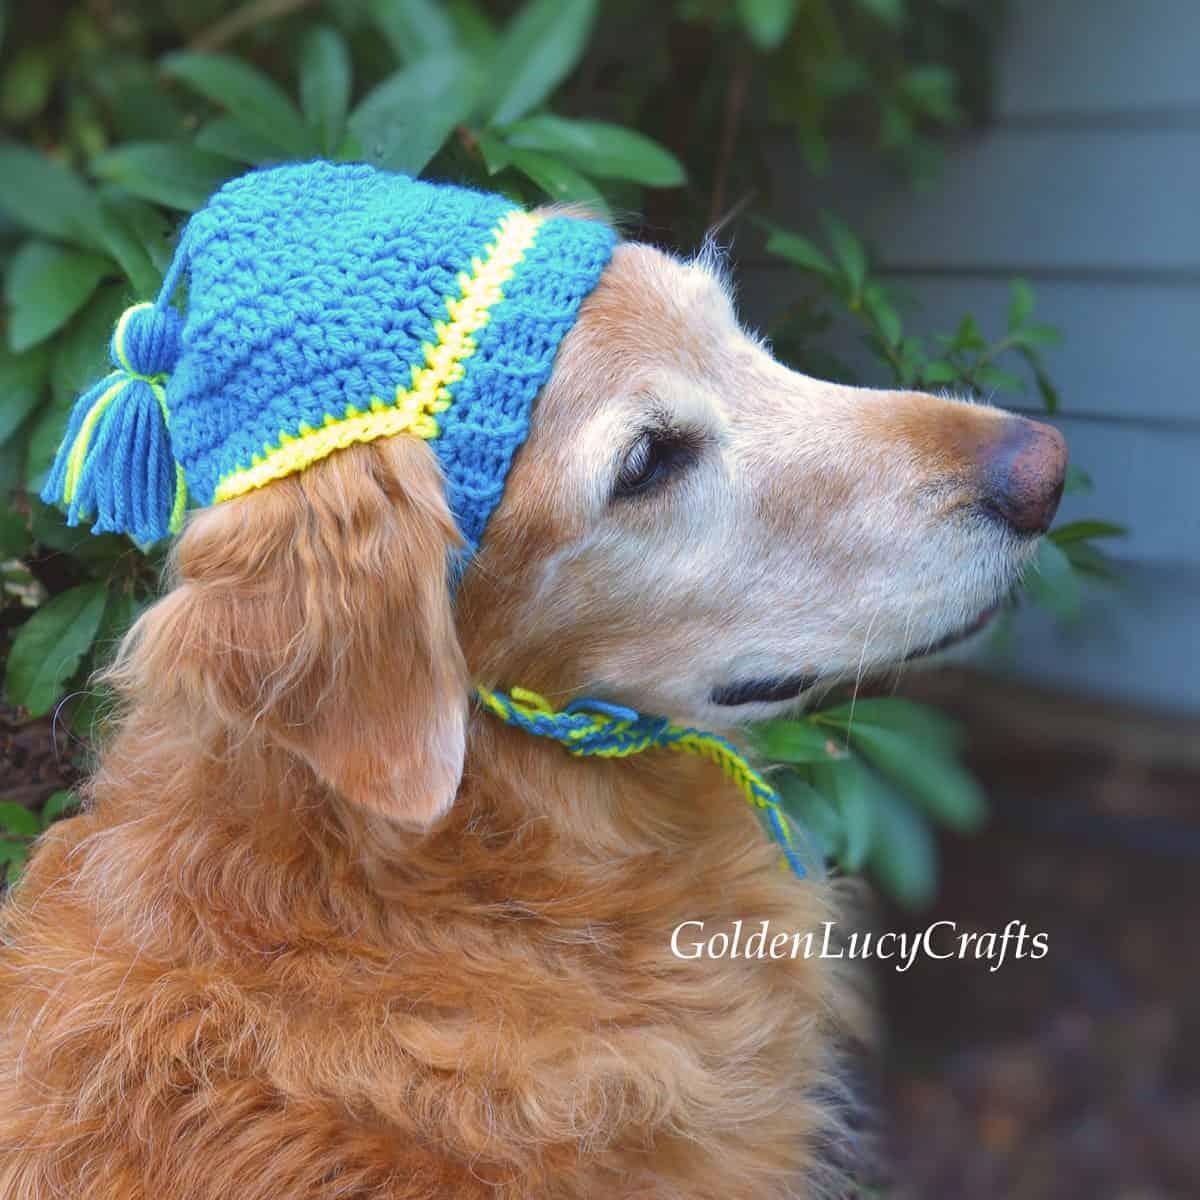 Golden retriever wearing blue crocheted hat.